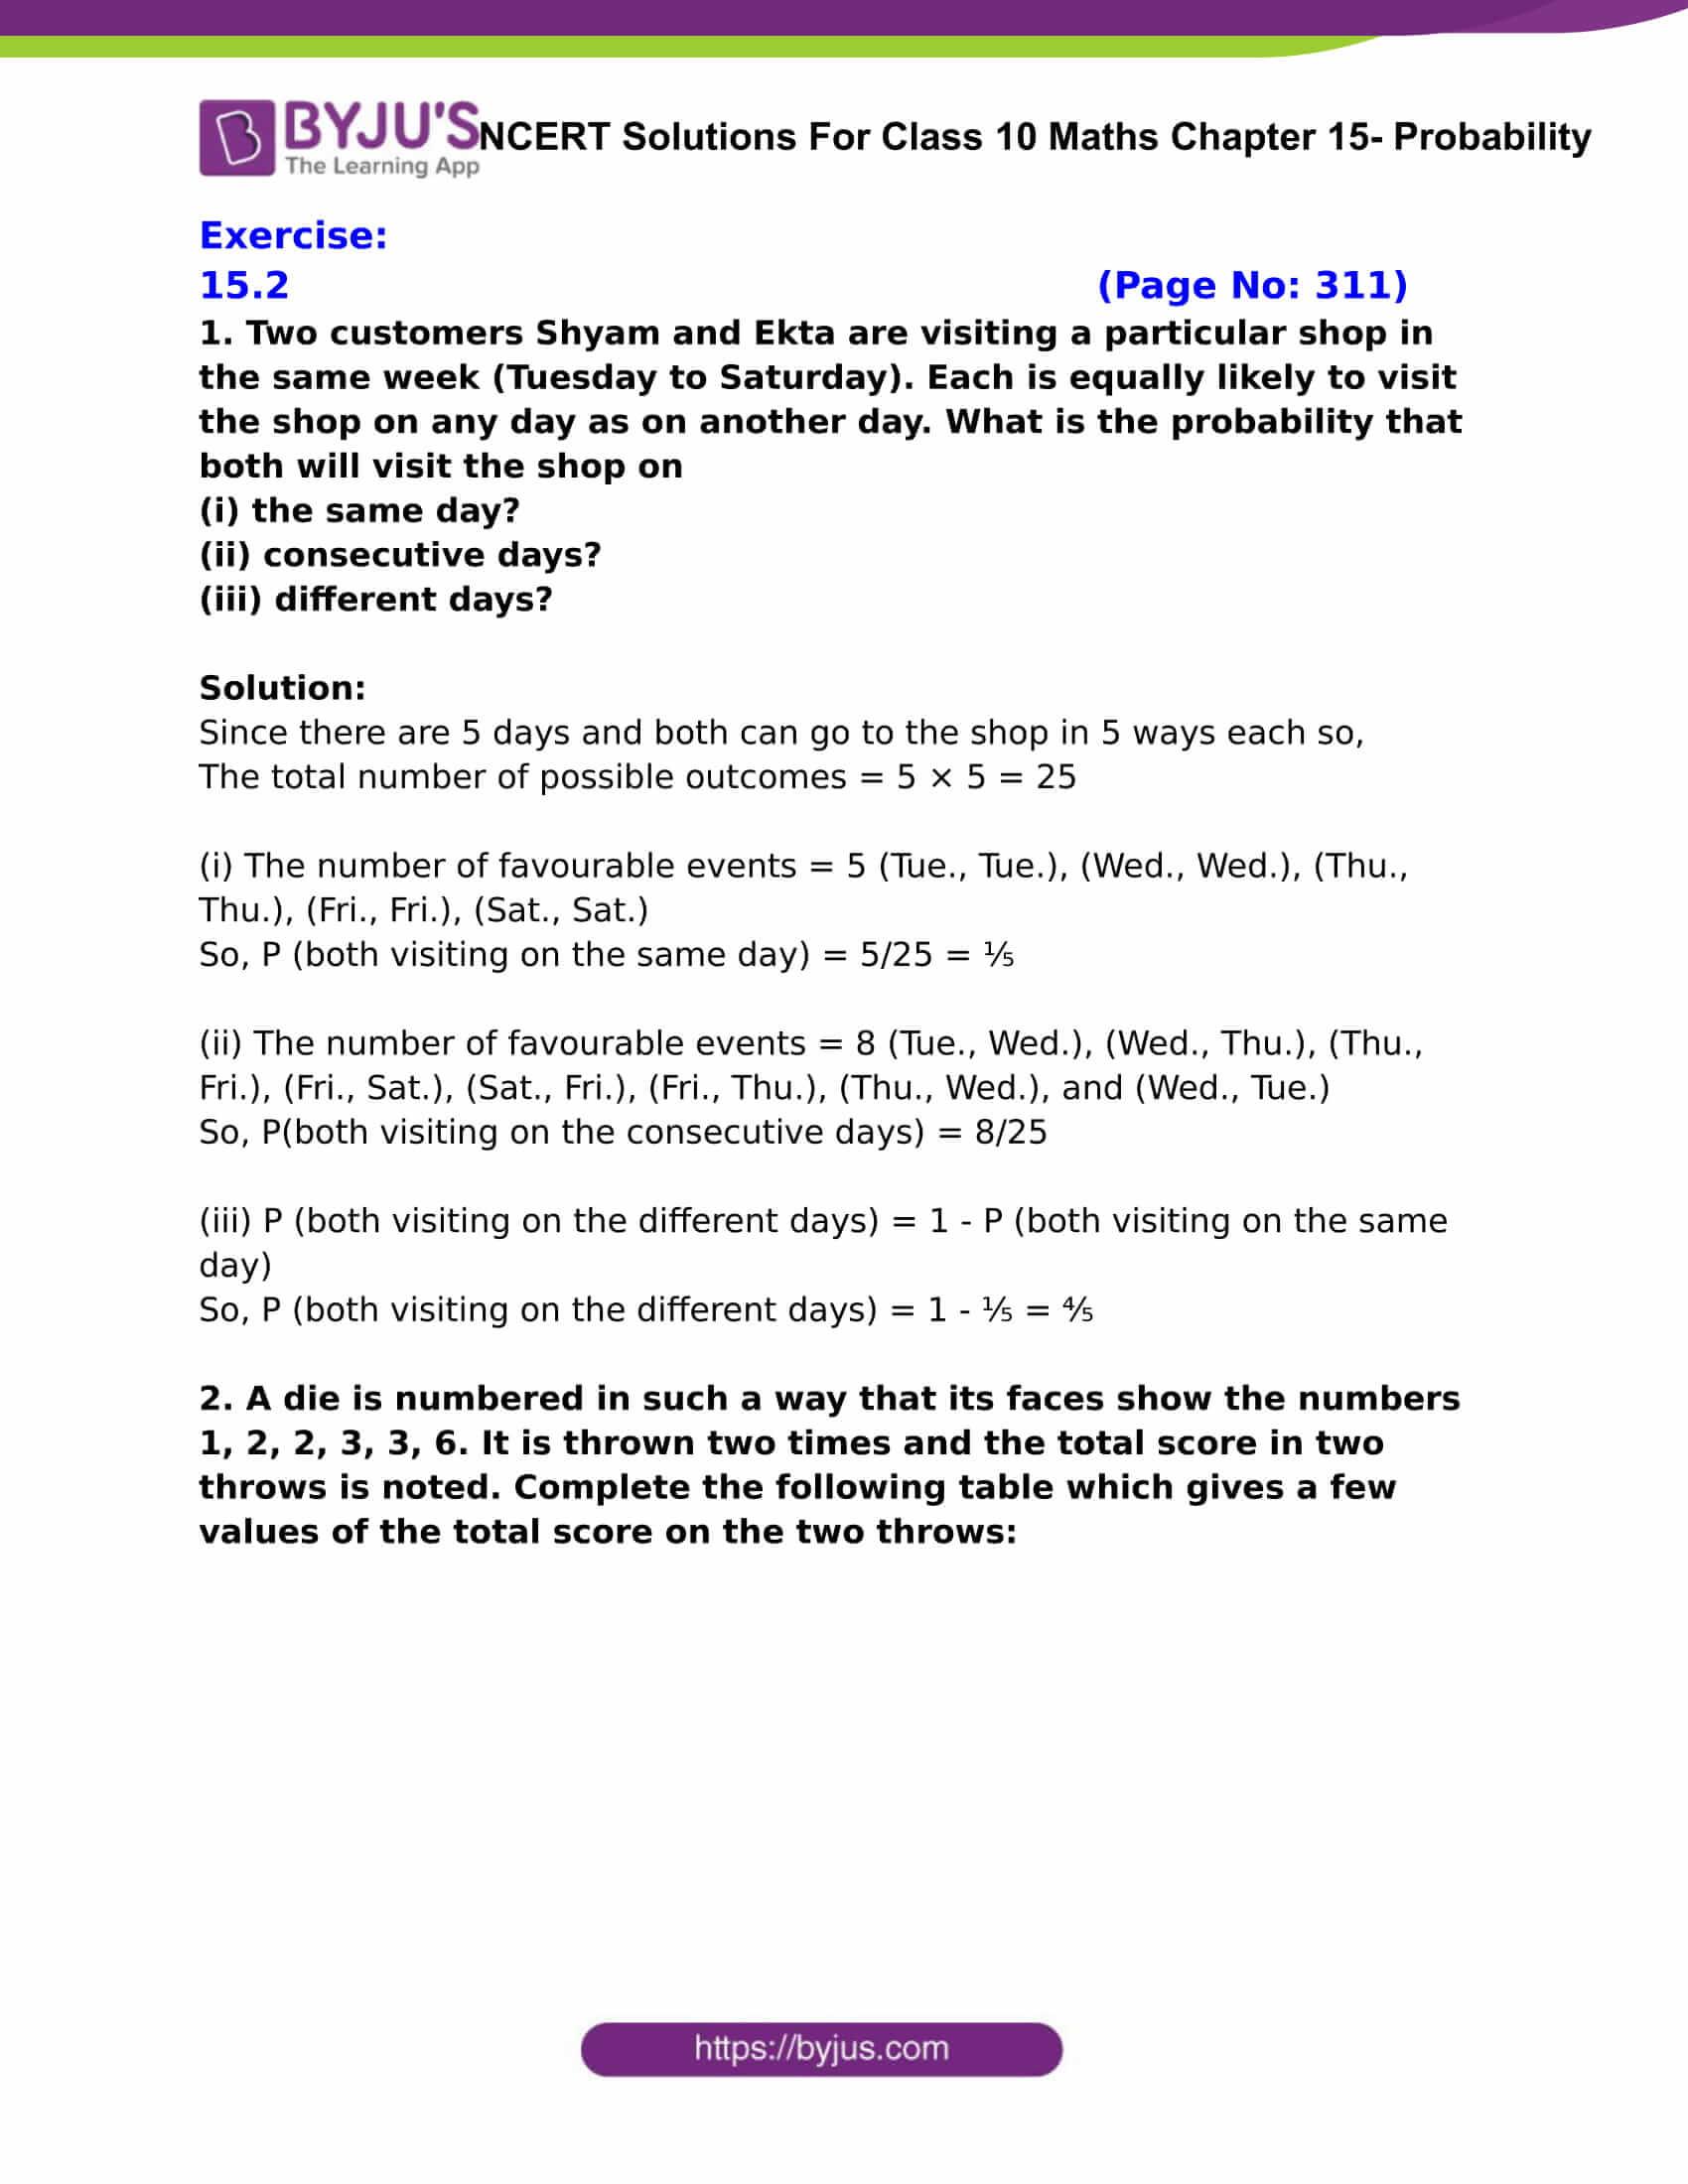 maths ncert solutions class 11 chapter 15 exercise 15.2